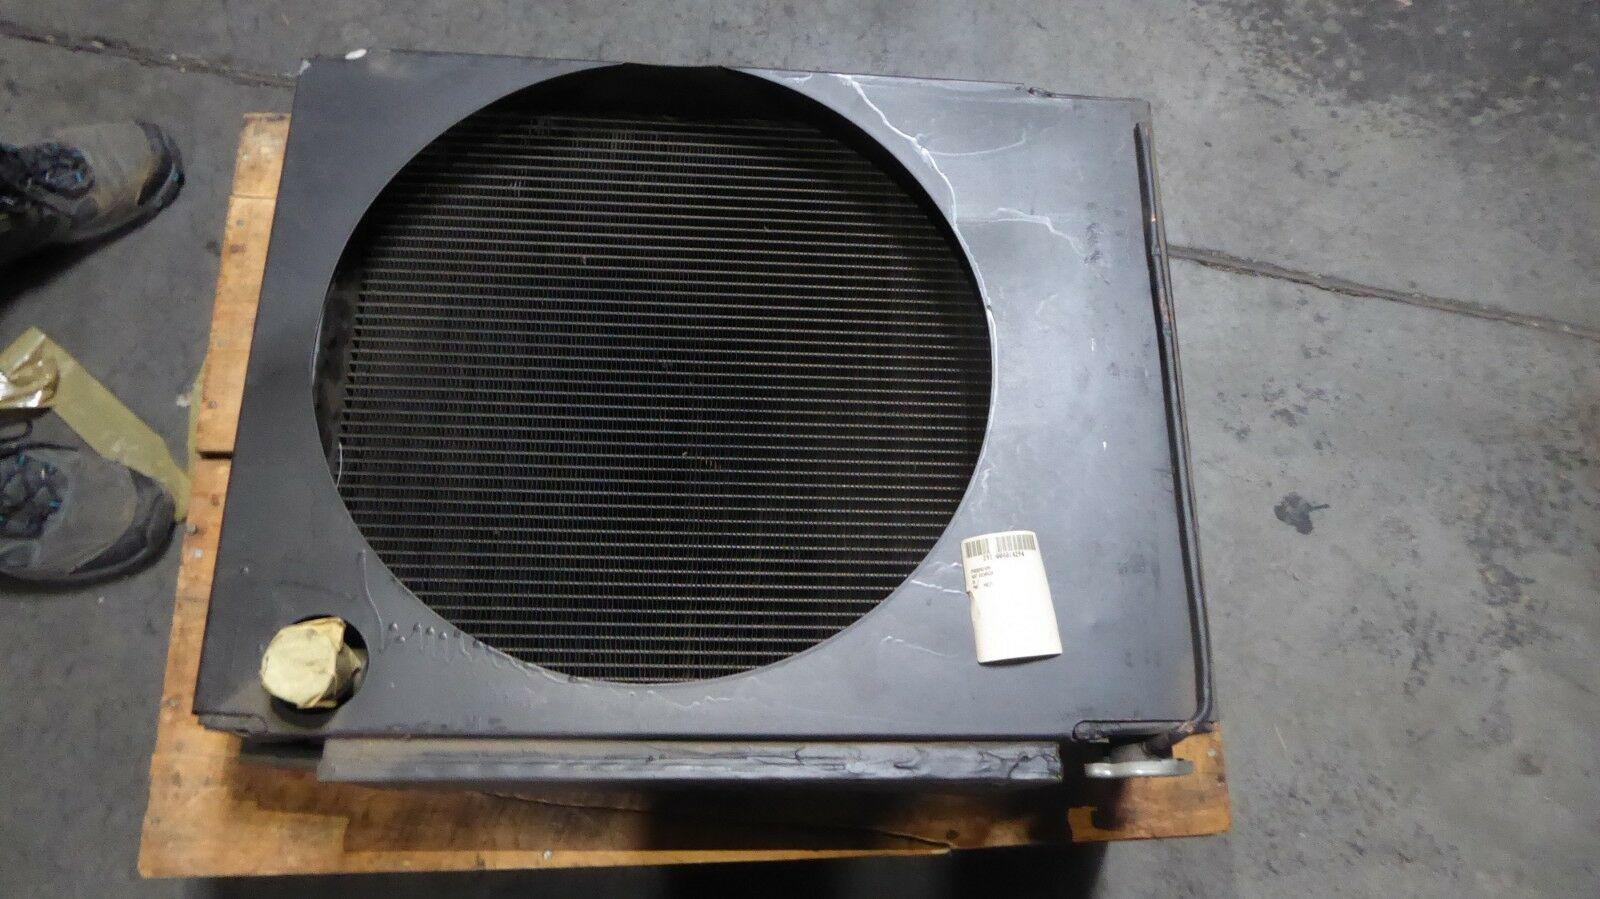 McCord Corp. 4921G6, 492100, DA492100 Radiator Engine Coolant